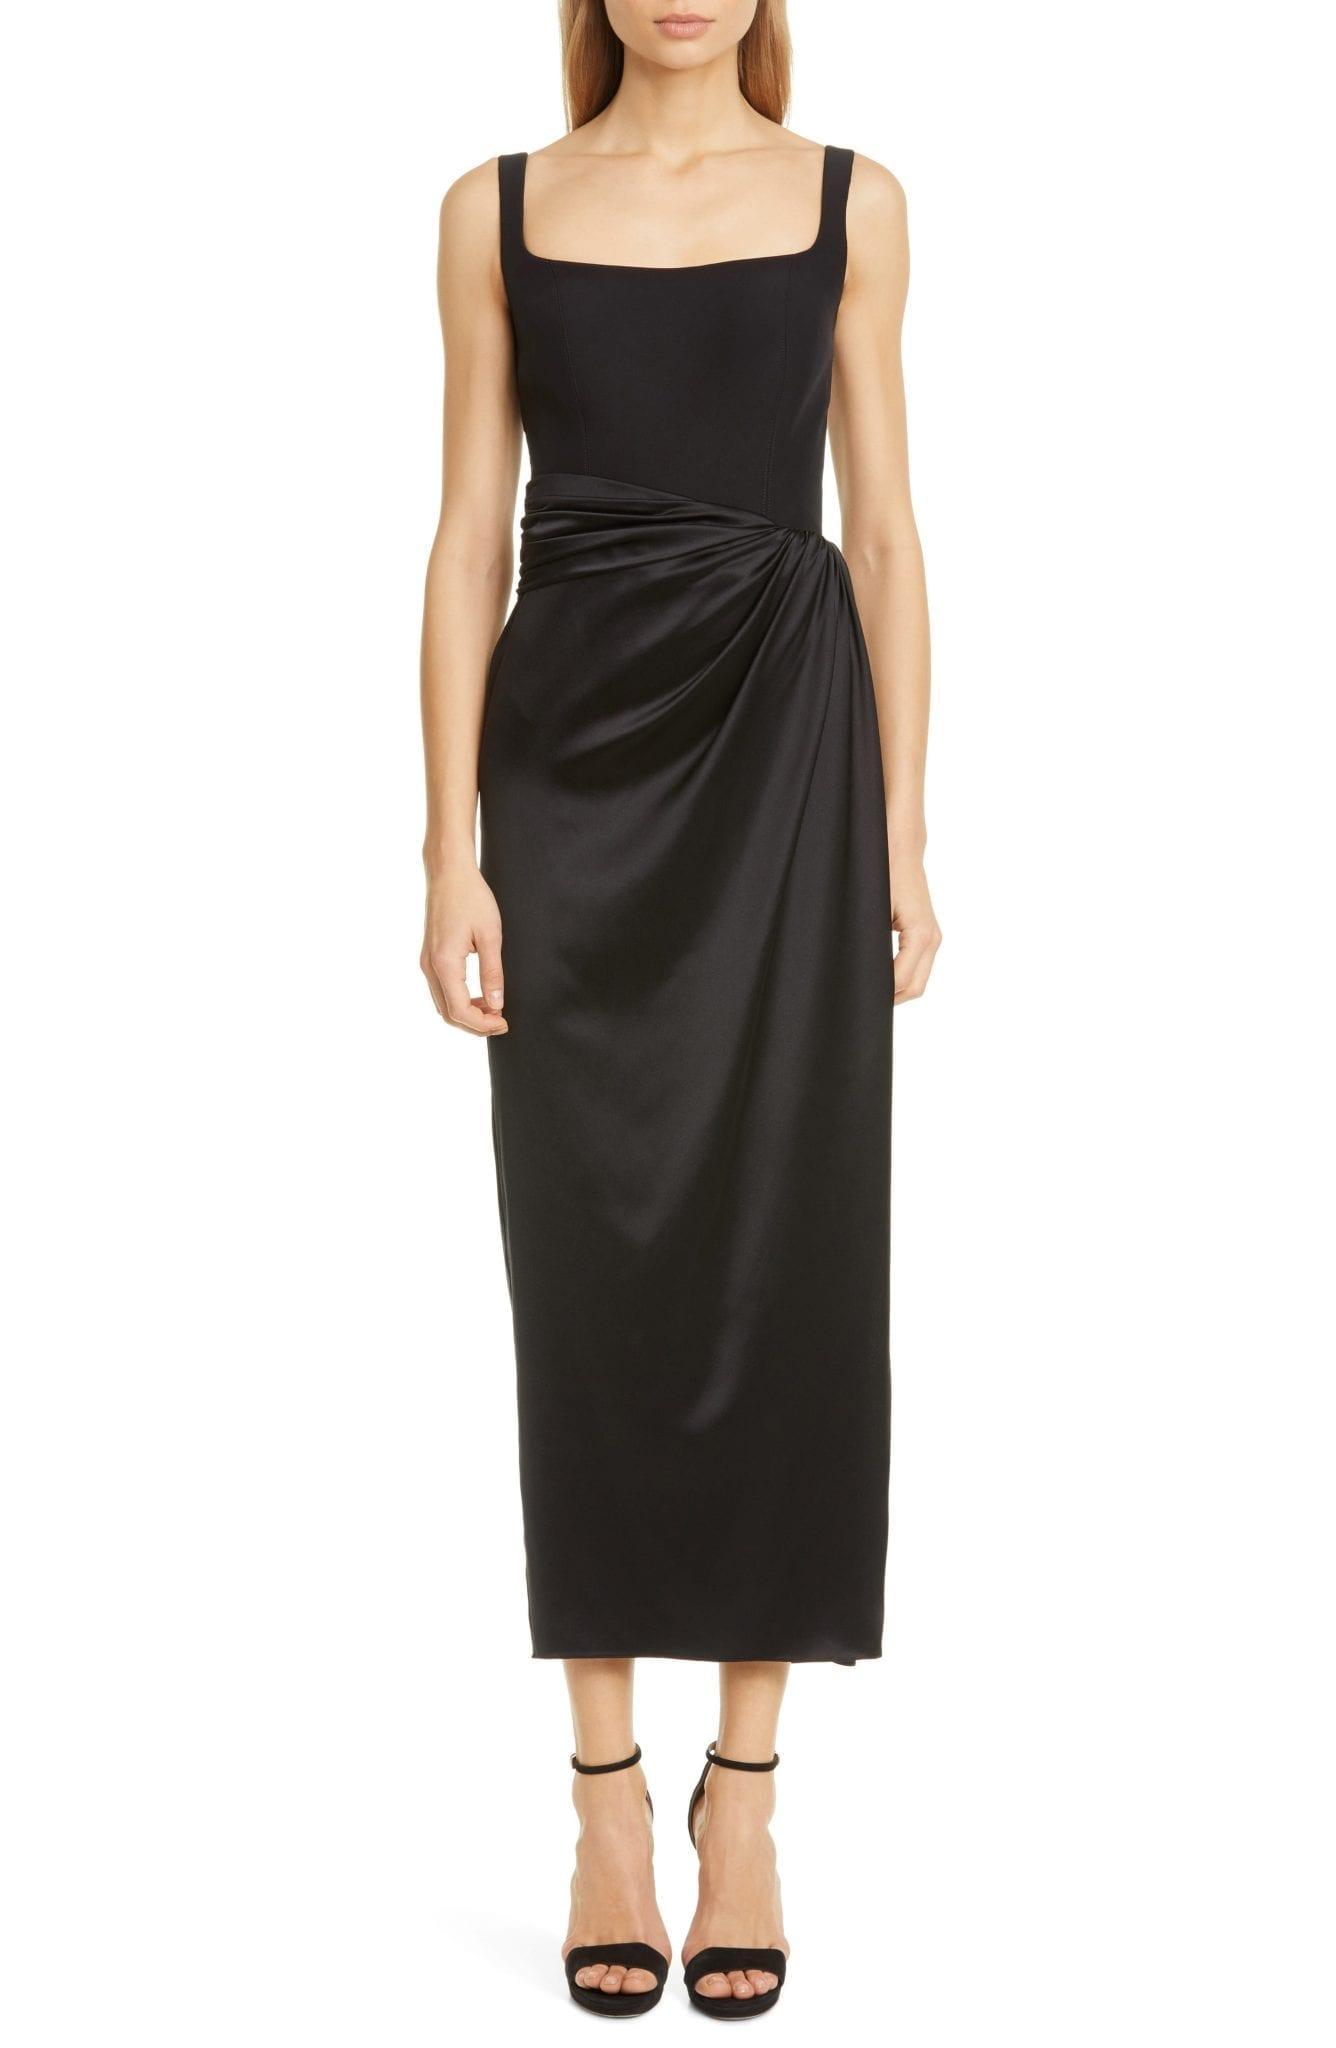 BRANDON MAXWELL Bustier Satin Skirt Silk Sheath Dress